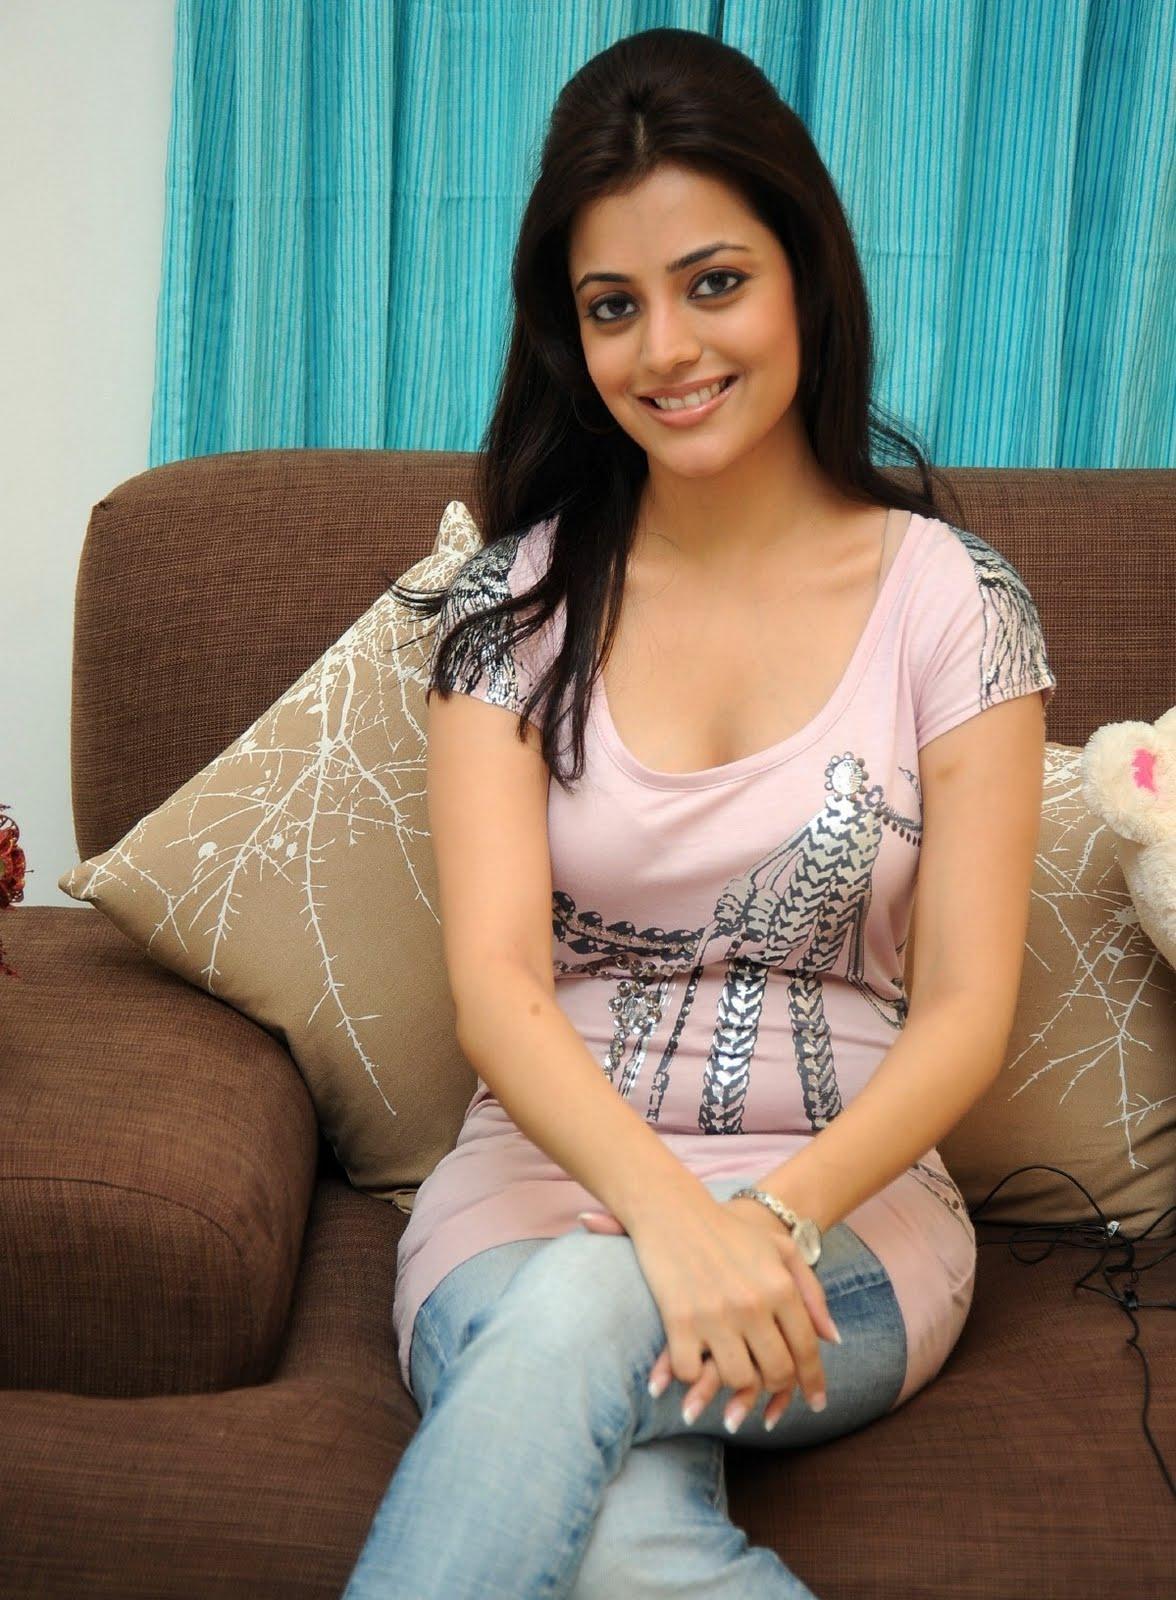 Beautiful Girls Pic: Kajal Agarwal's Sister Nisha Agarwal